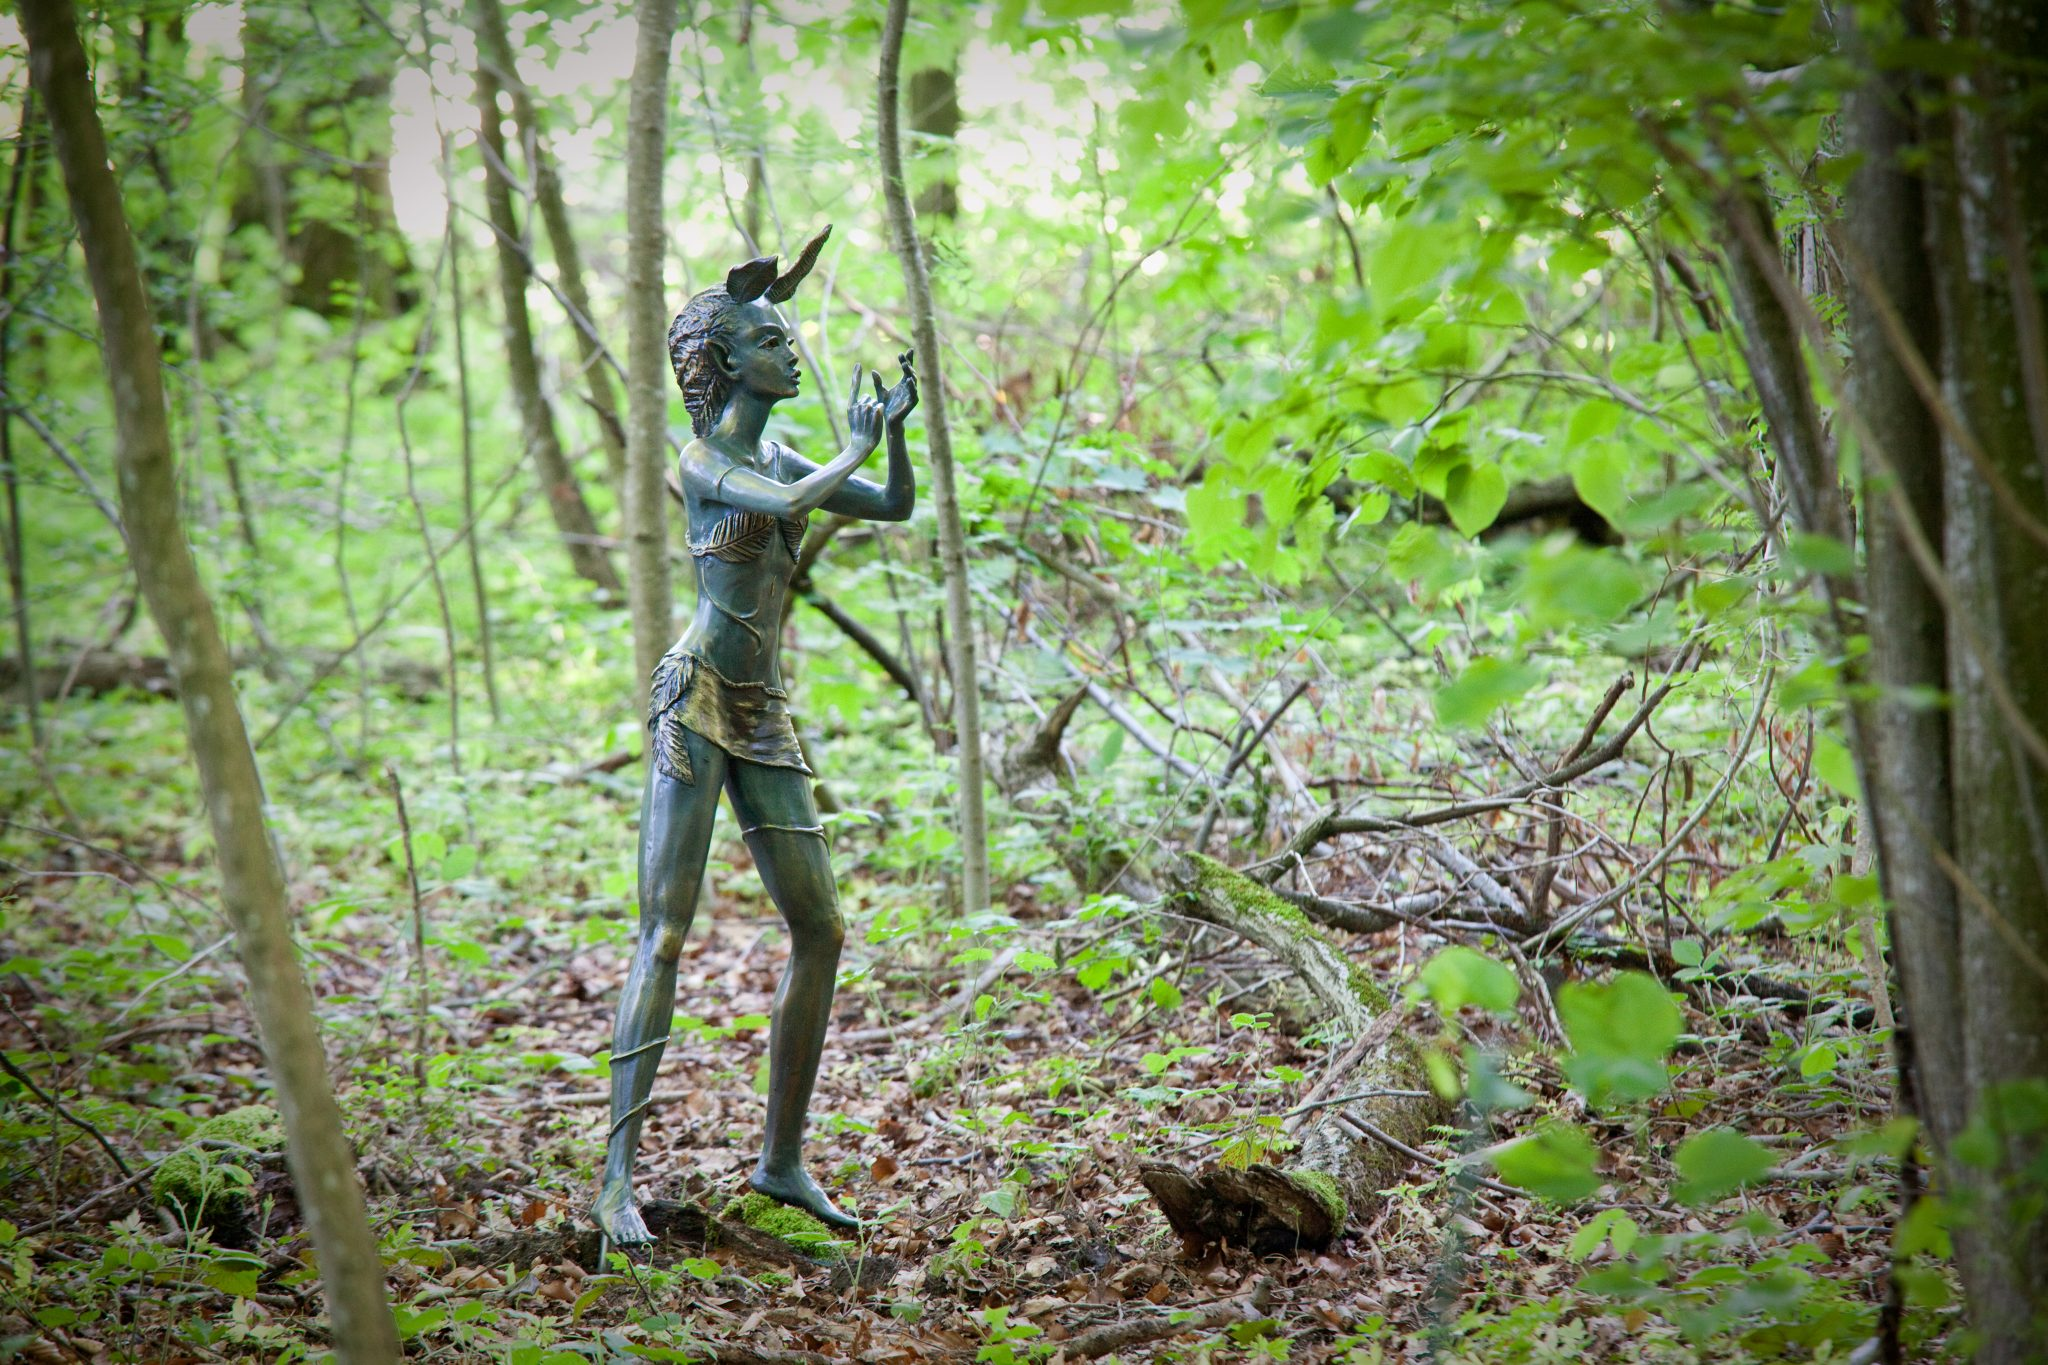 Entchanted_woodland_jardin_des_iris_regiscolombo